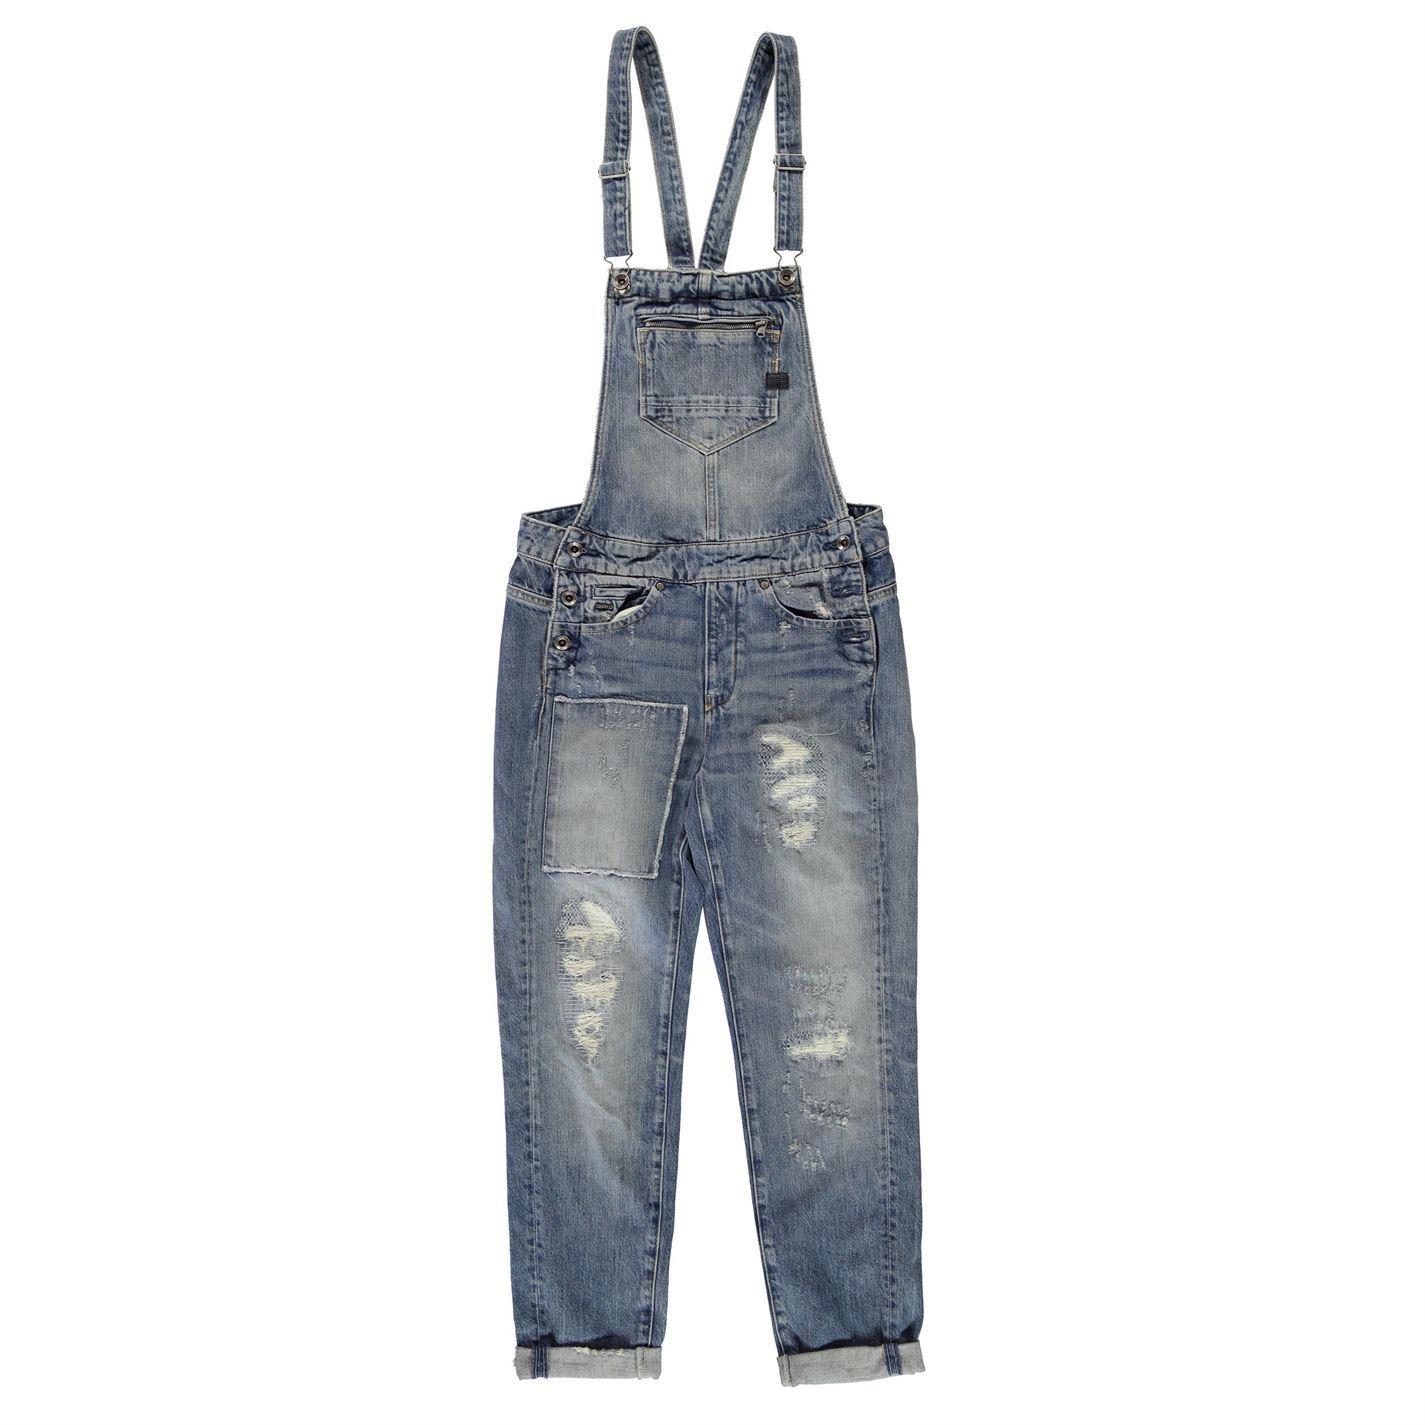 a804737b1d4d9 G Star Womens Midge Slim Salopette Jumpsuit Cotton Zip Distressed Tonal